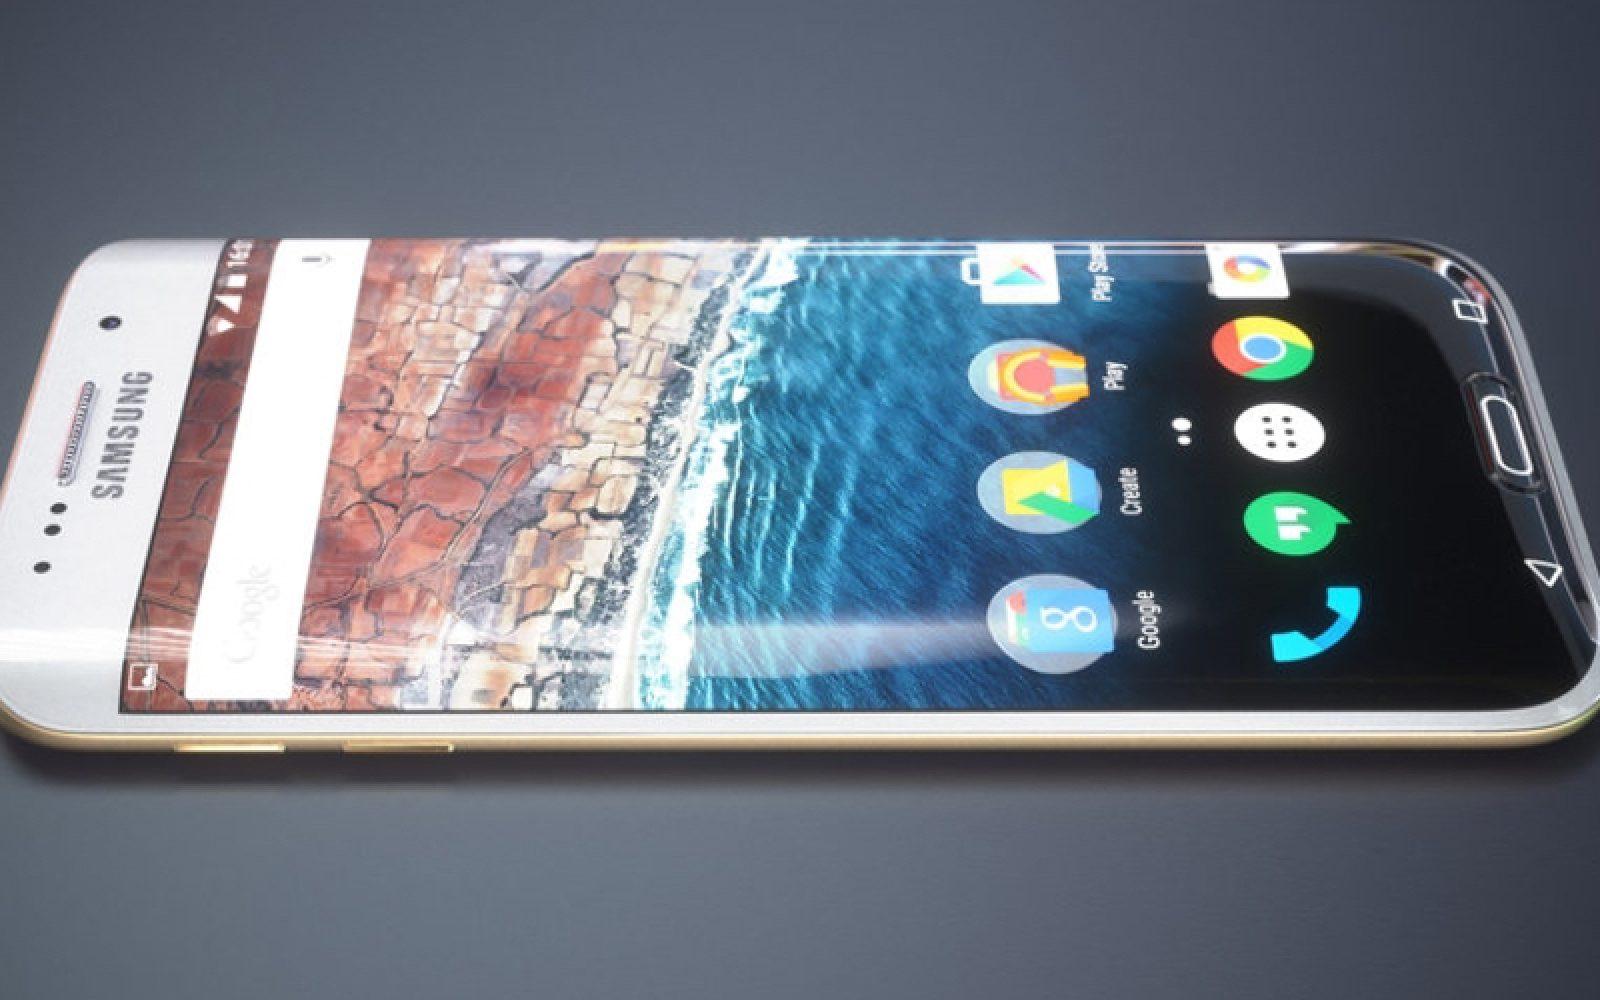 Report: Galaxy S7 to launch alongside Samsung phone upgrade/rental program